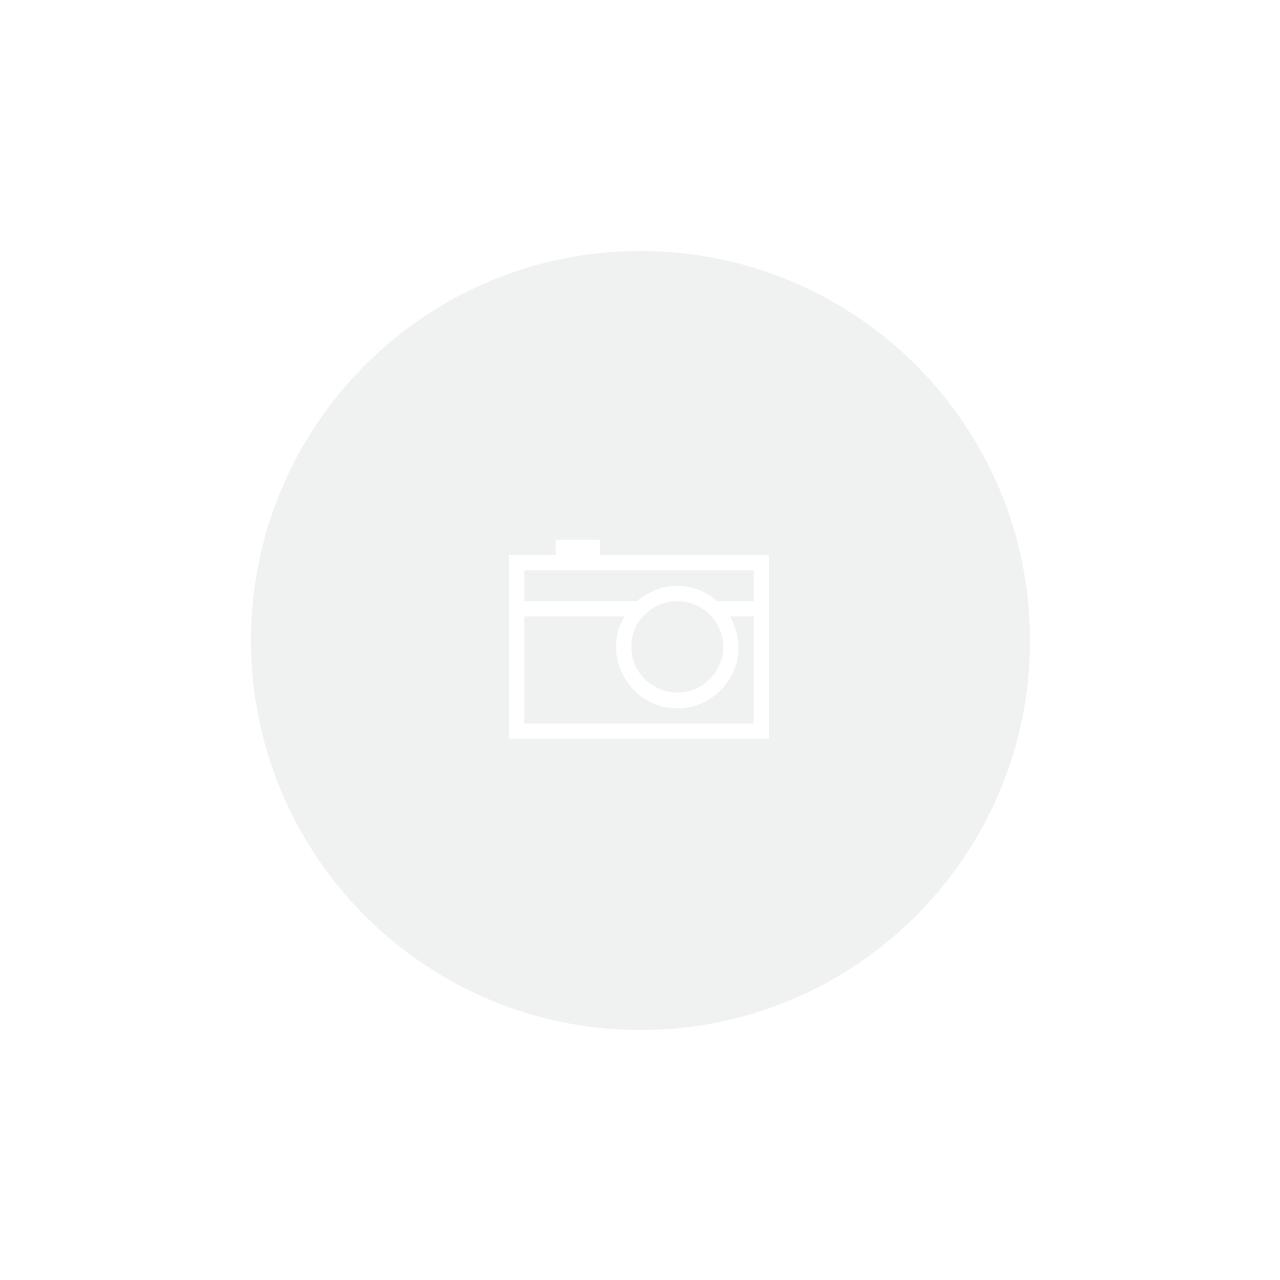 BICICLETA 29 BMC FOURSTROKE 01-THREE 2019 12V EAGLE GX